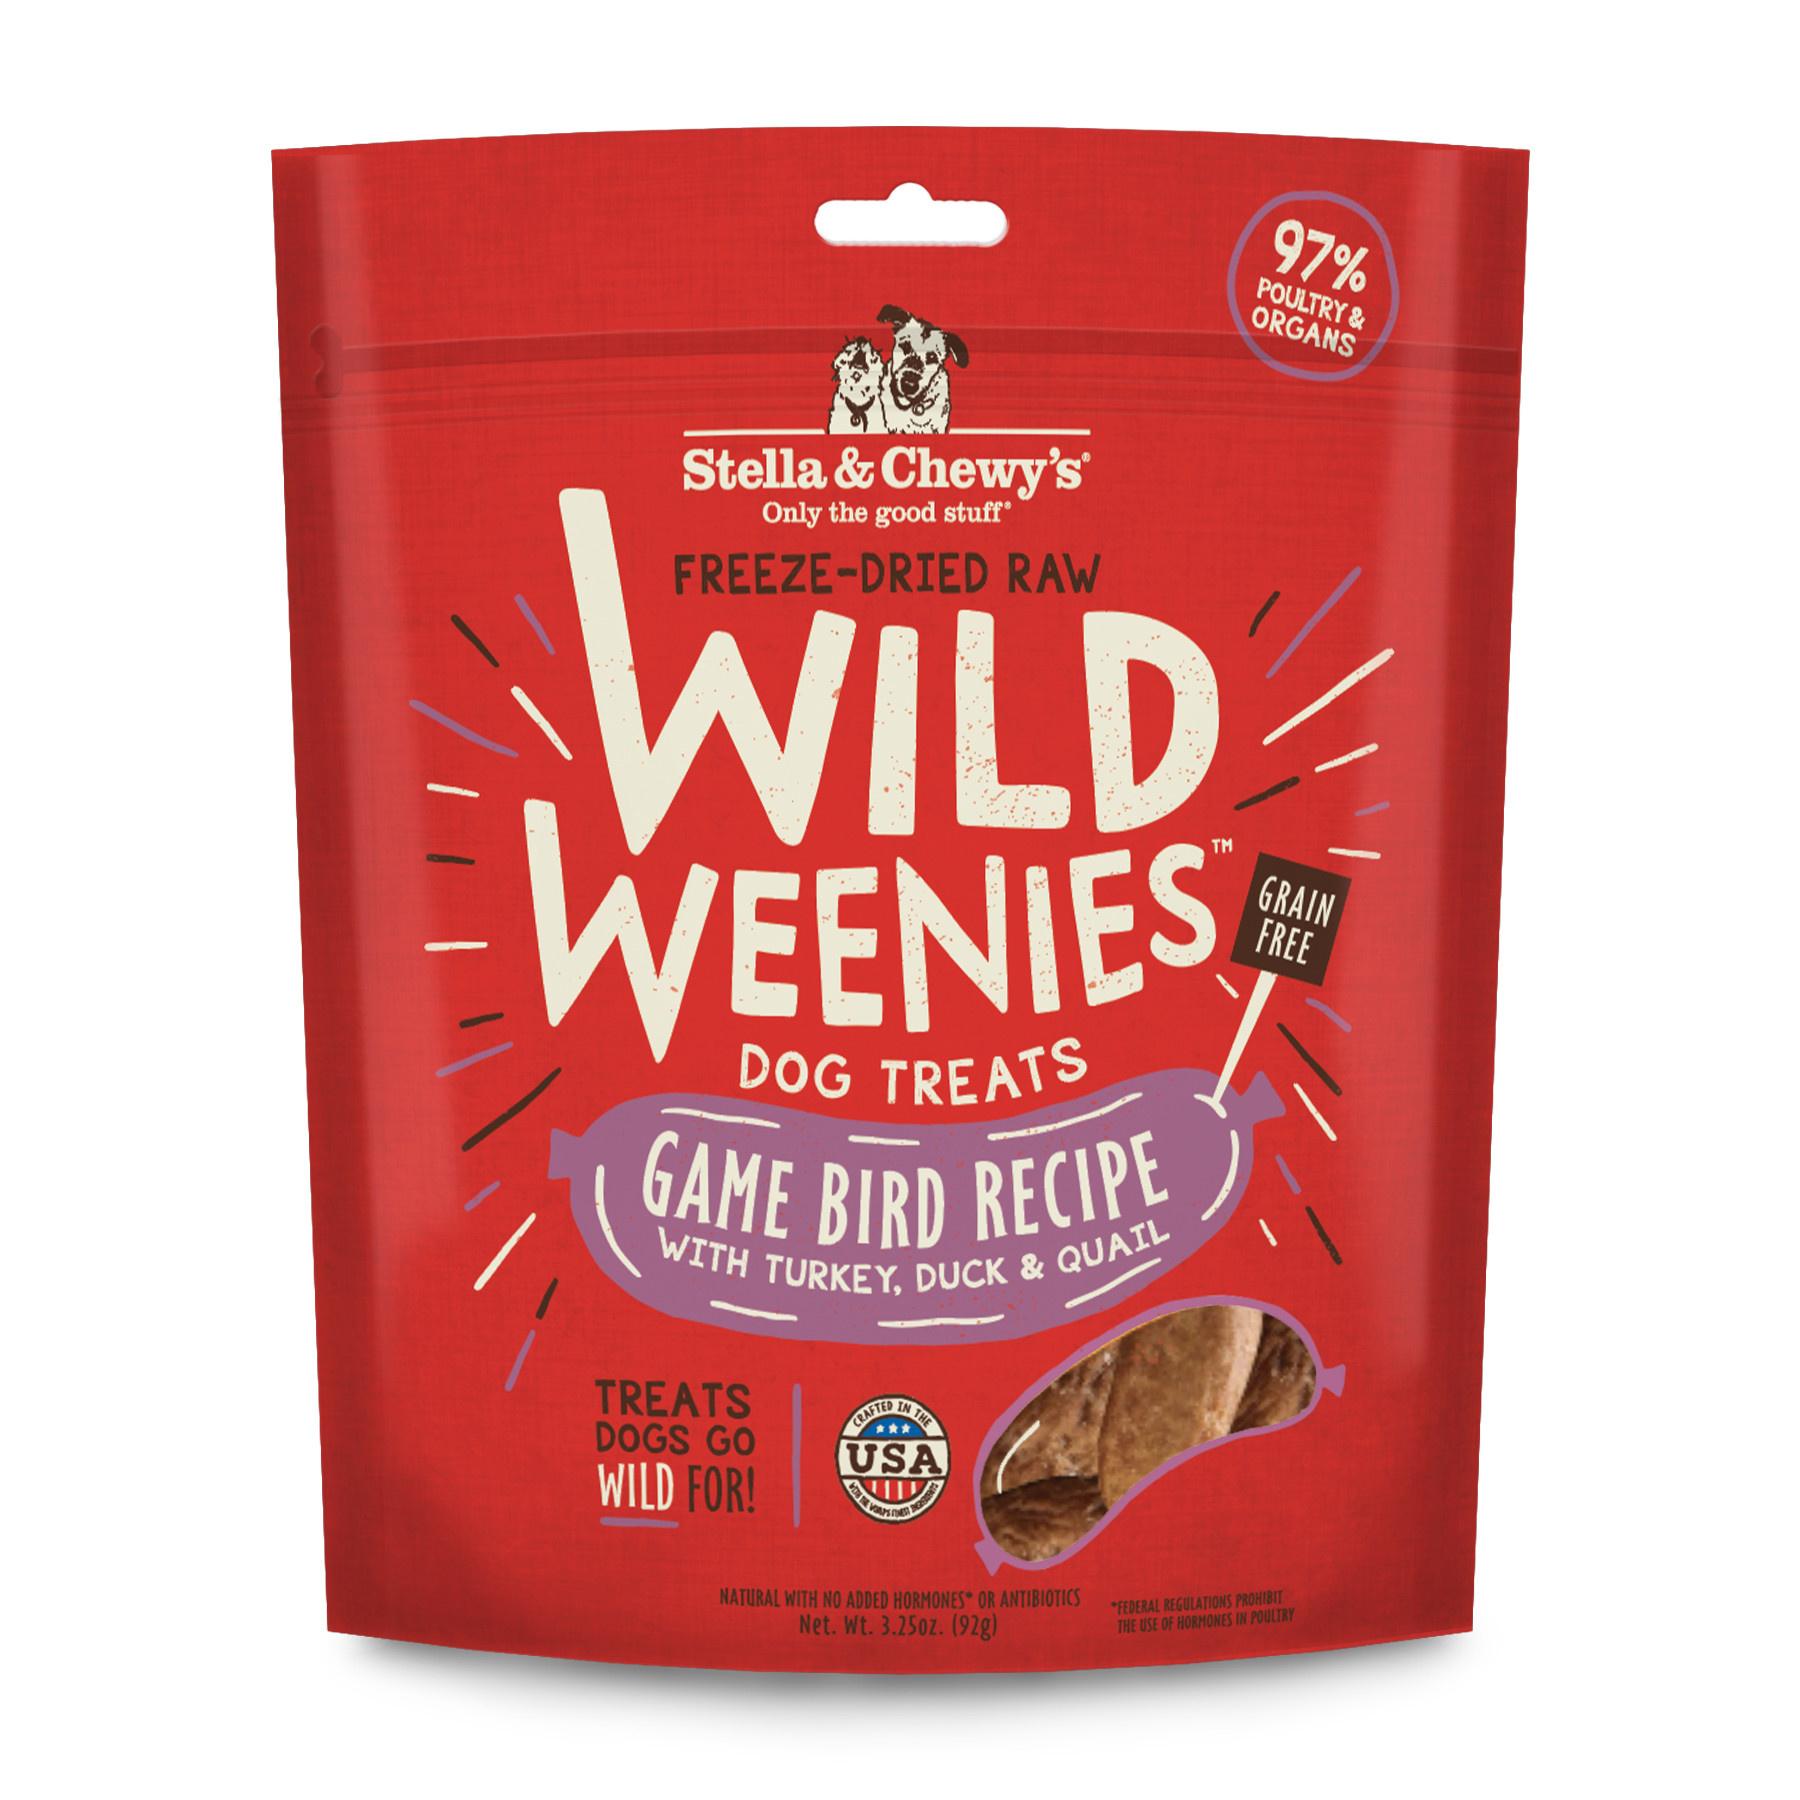 Stella & Chewy's STELLA & CHEWY'S Game Bird Wild Weenies Dog Treats 3 25 oz